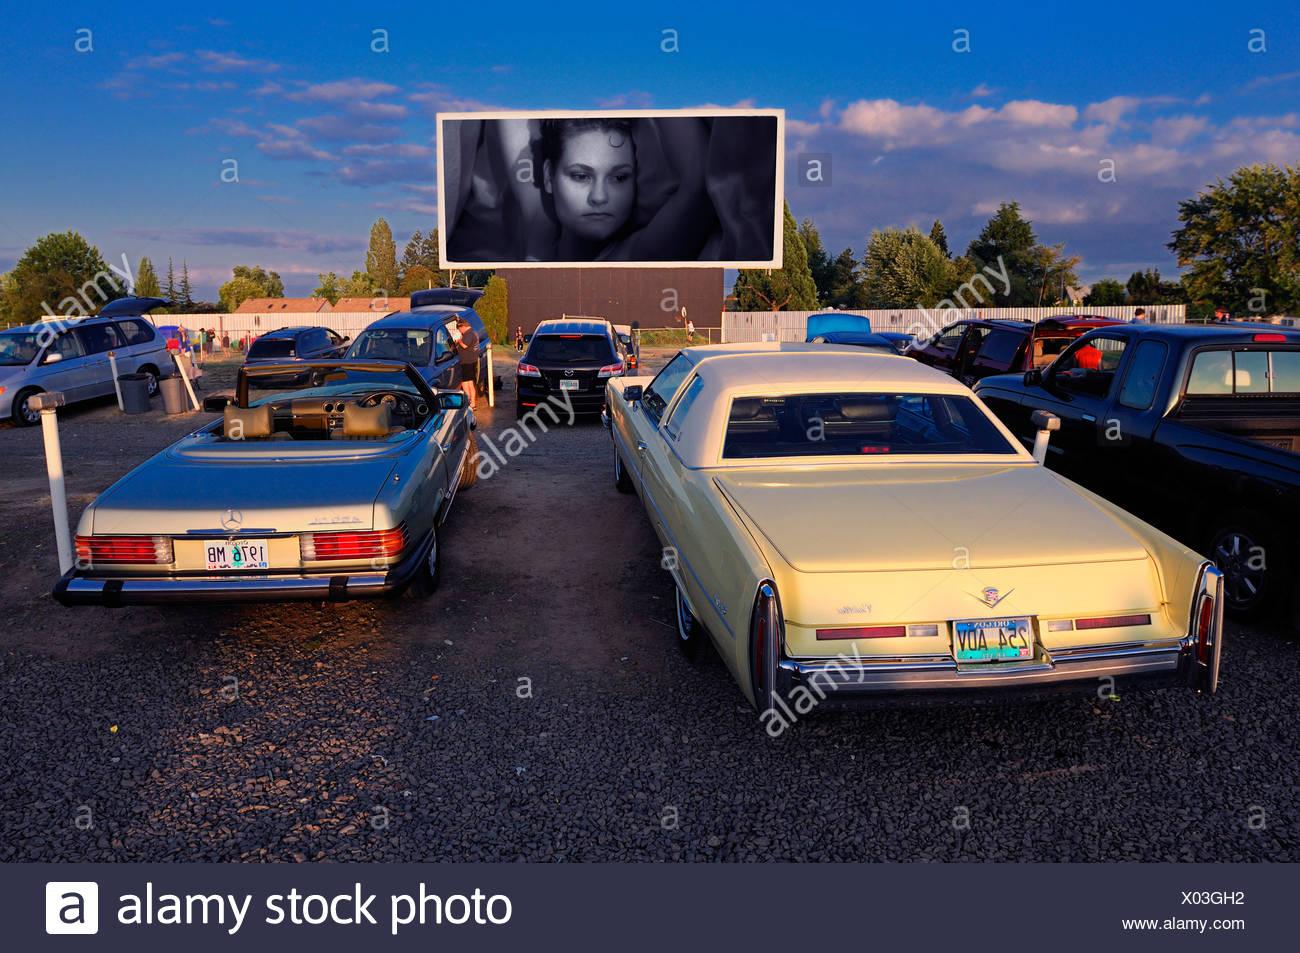 Parking car cinema stock photos parking car cinema stock for Motor vu drive in dallas oregon